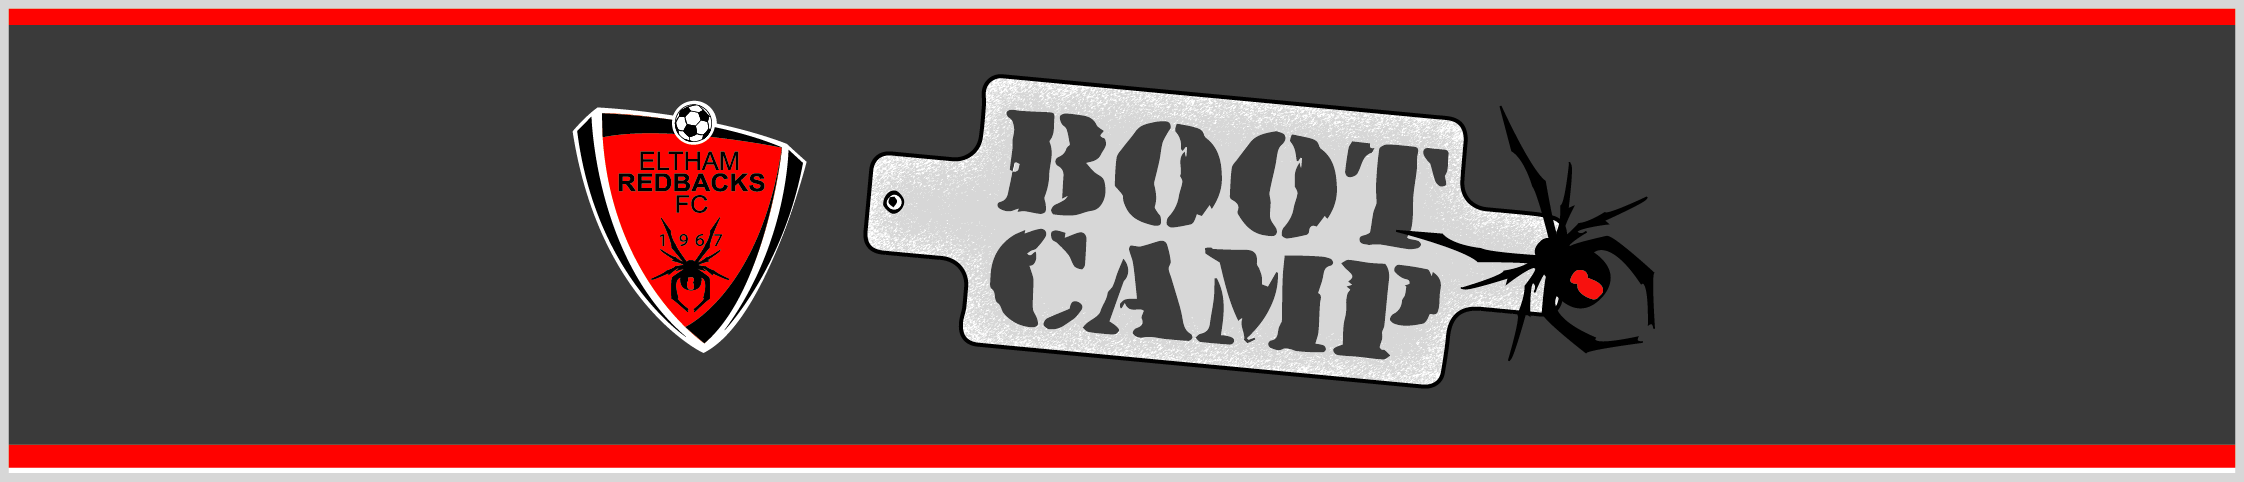 BootCamp3-01